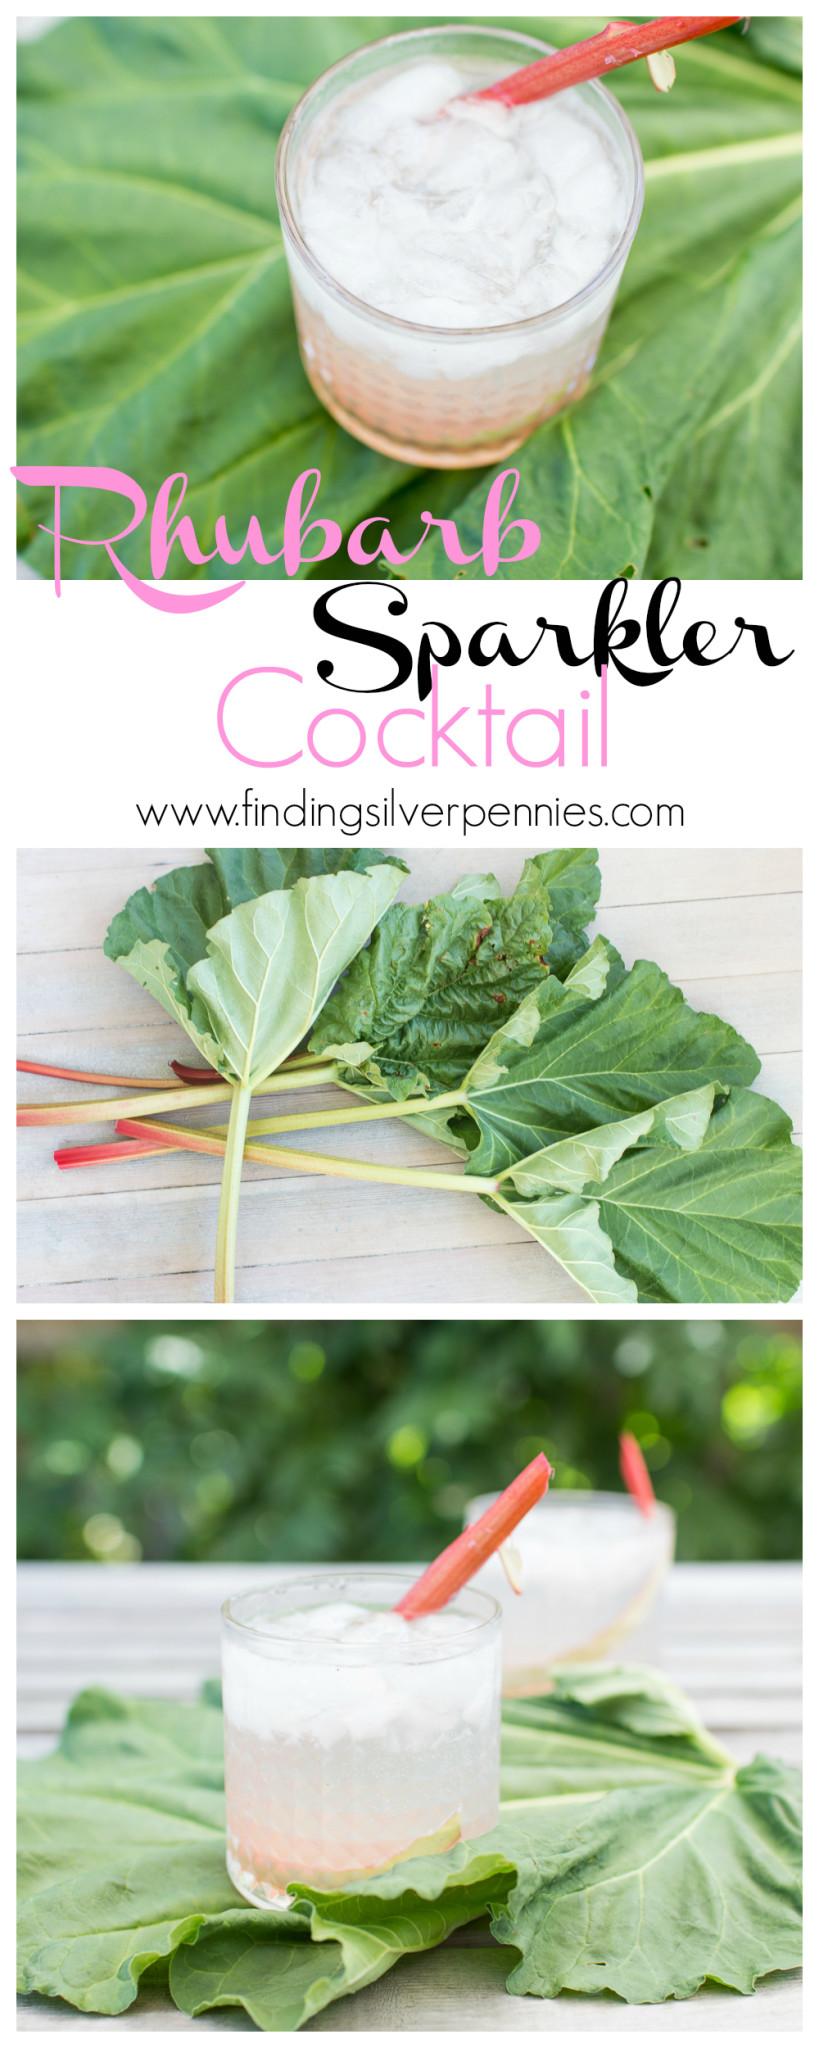 Rhubarb Sparkler Cocktail